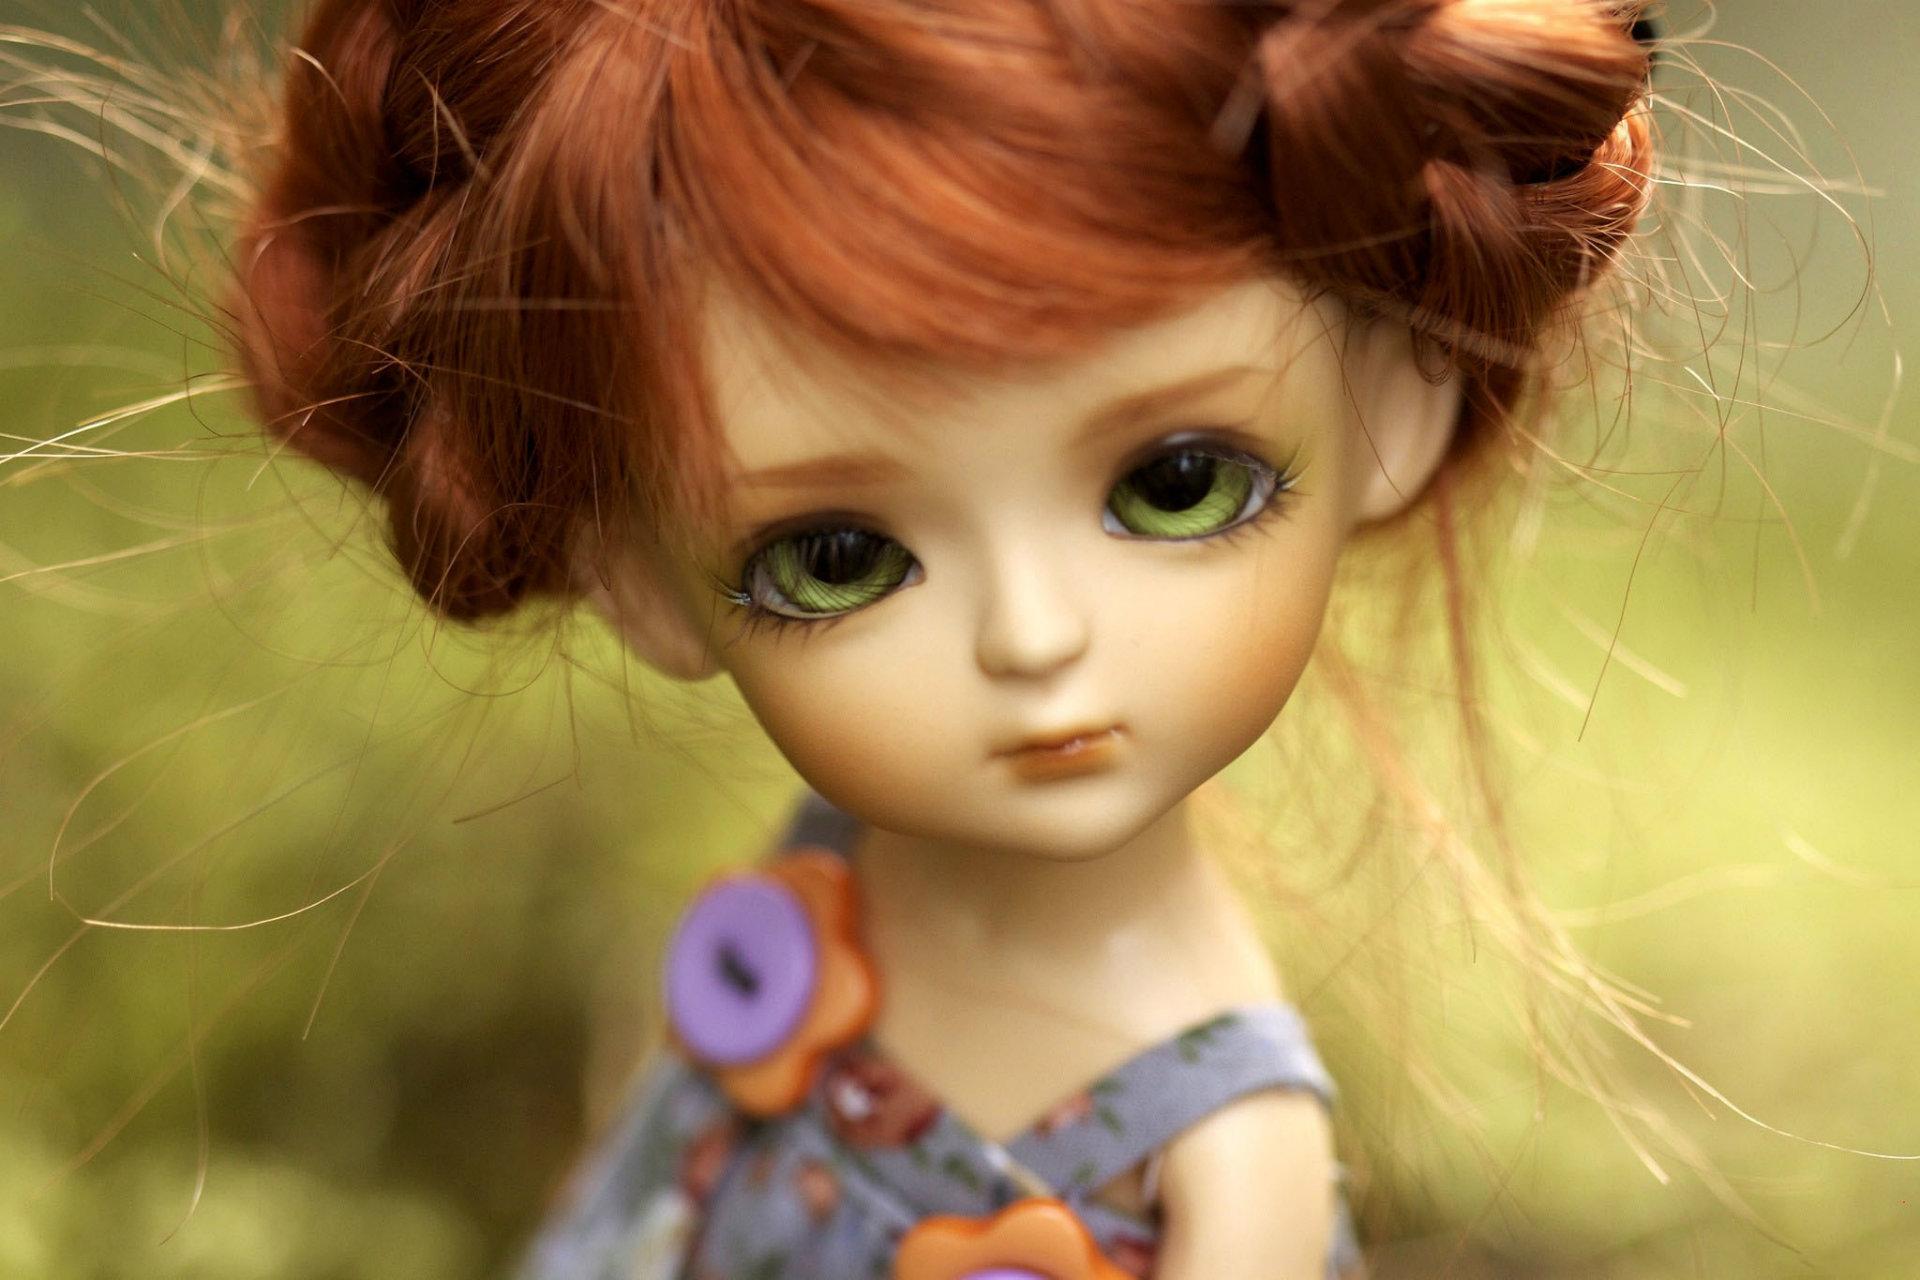 Beautiful Doll HD Wallpapers Cute Desktop 1920x1280